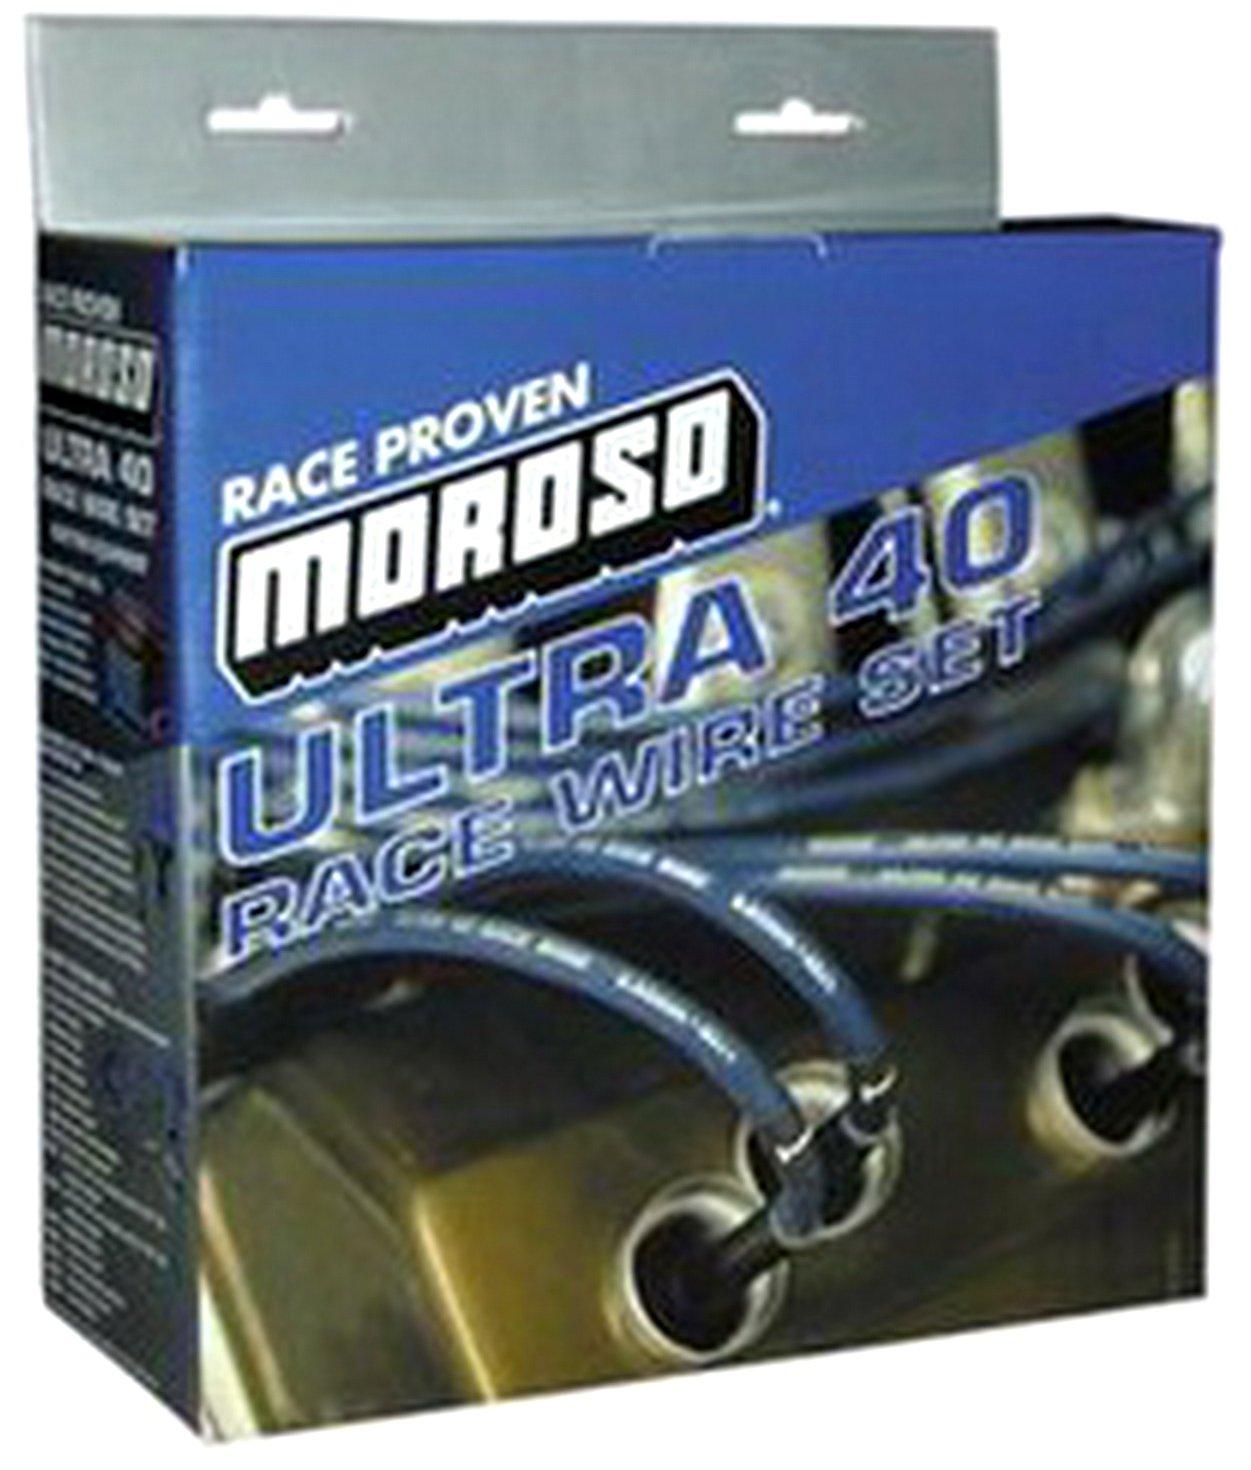 Moroso 73607 Ult40 Racewir Sbc Und.Hei